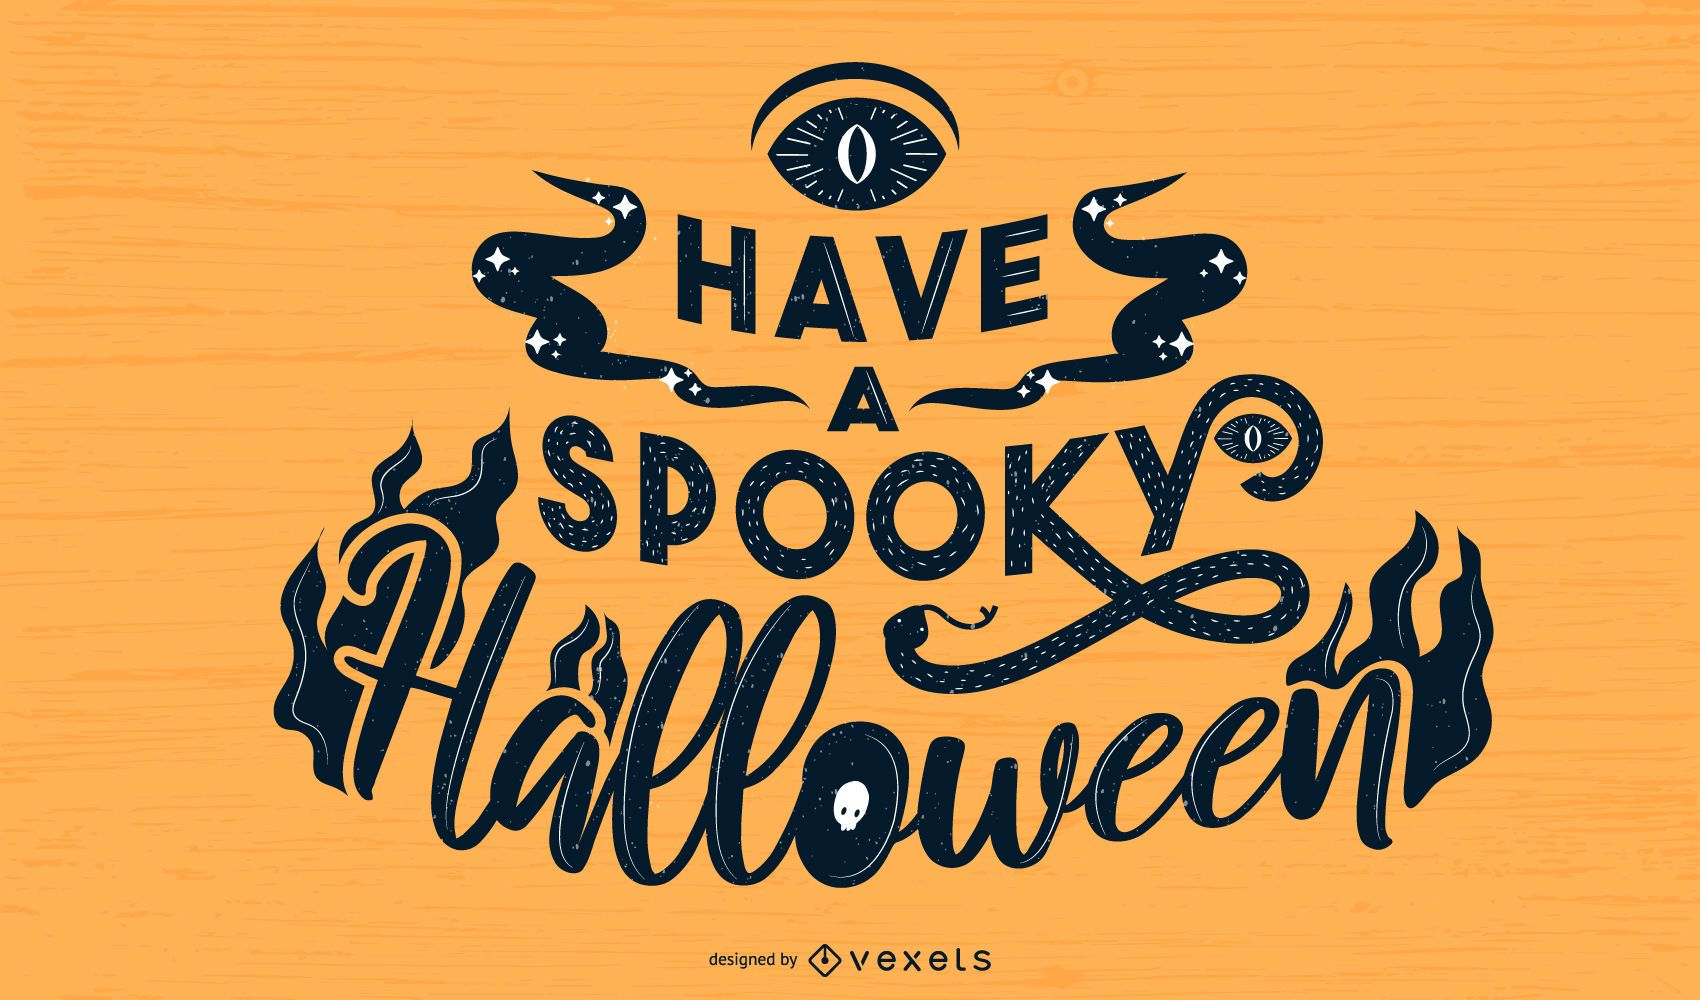 Spooky Halloween lettering design